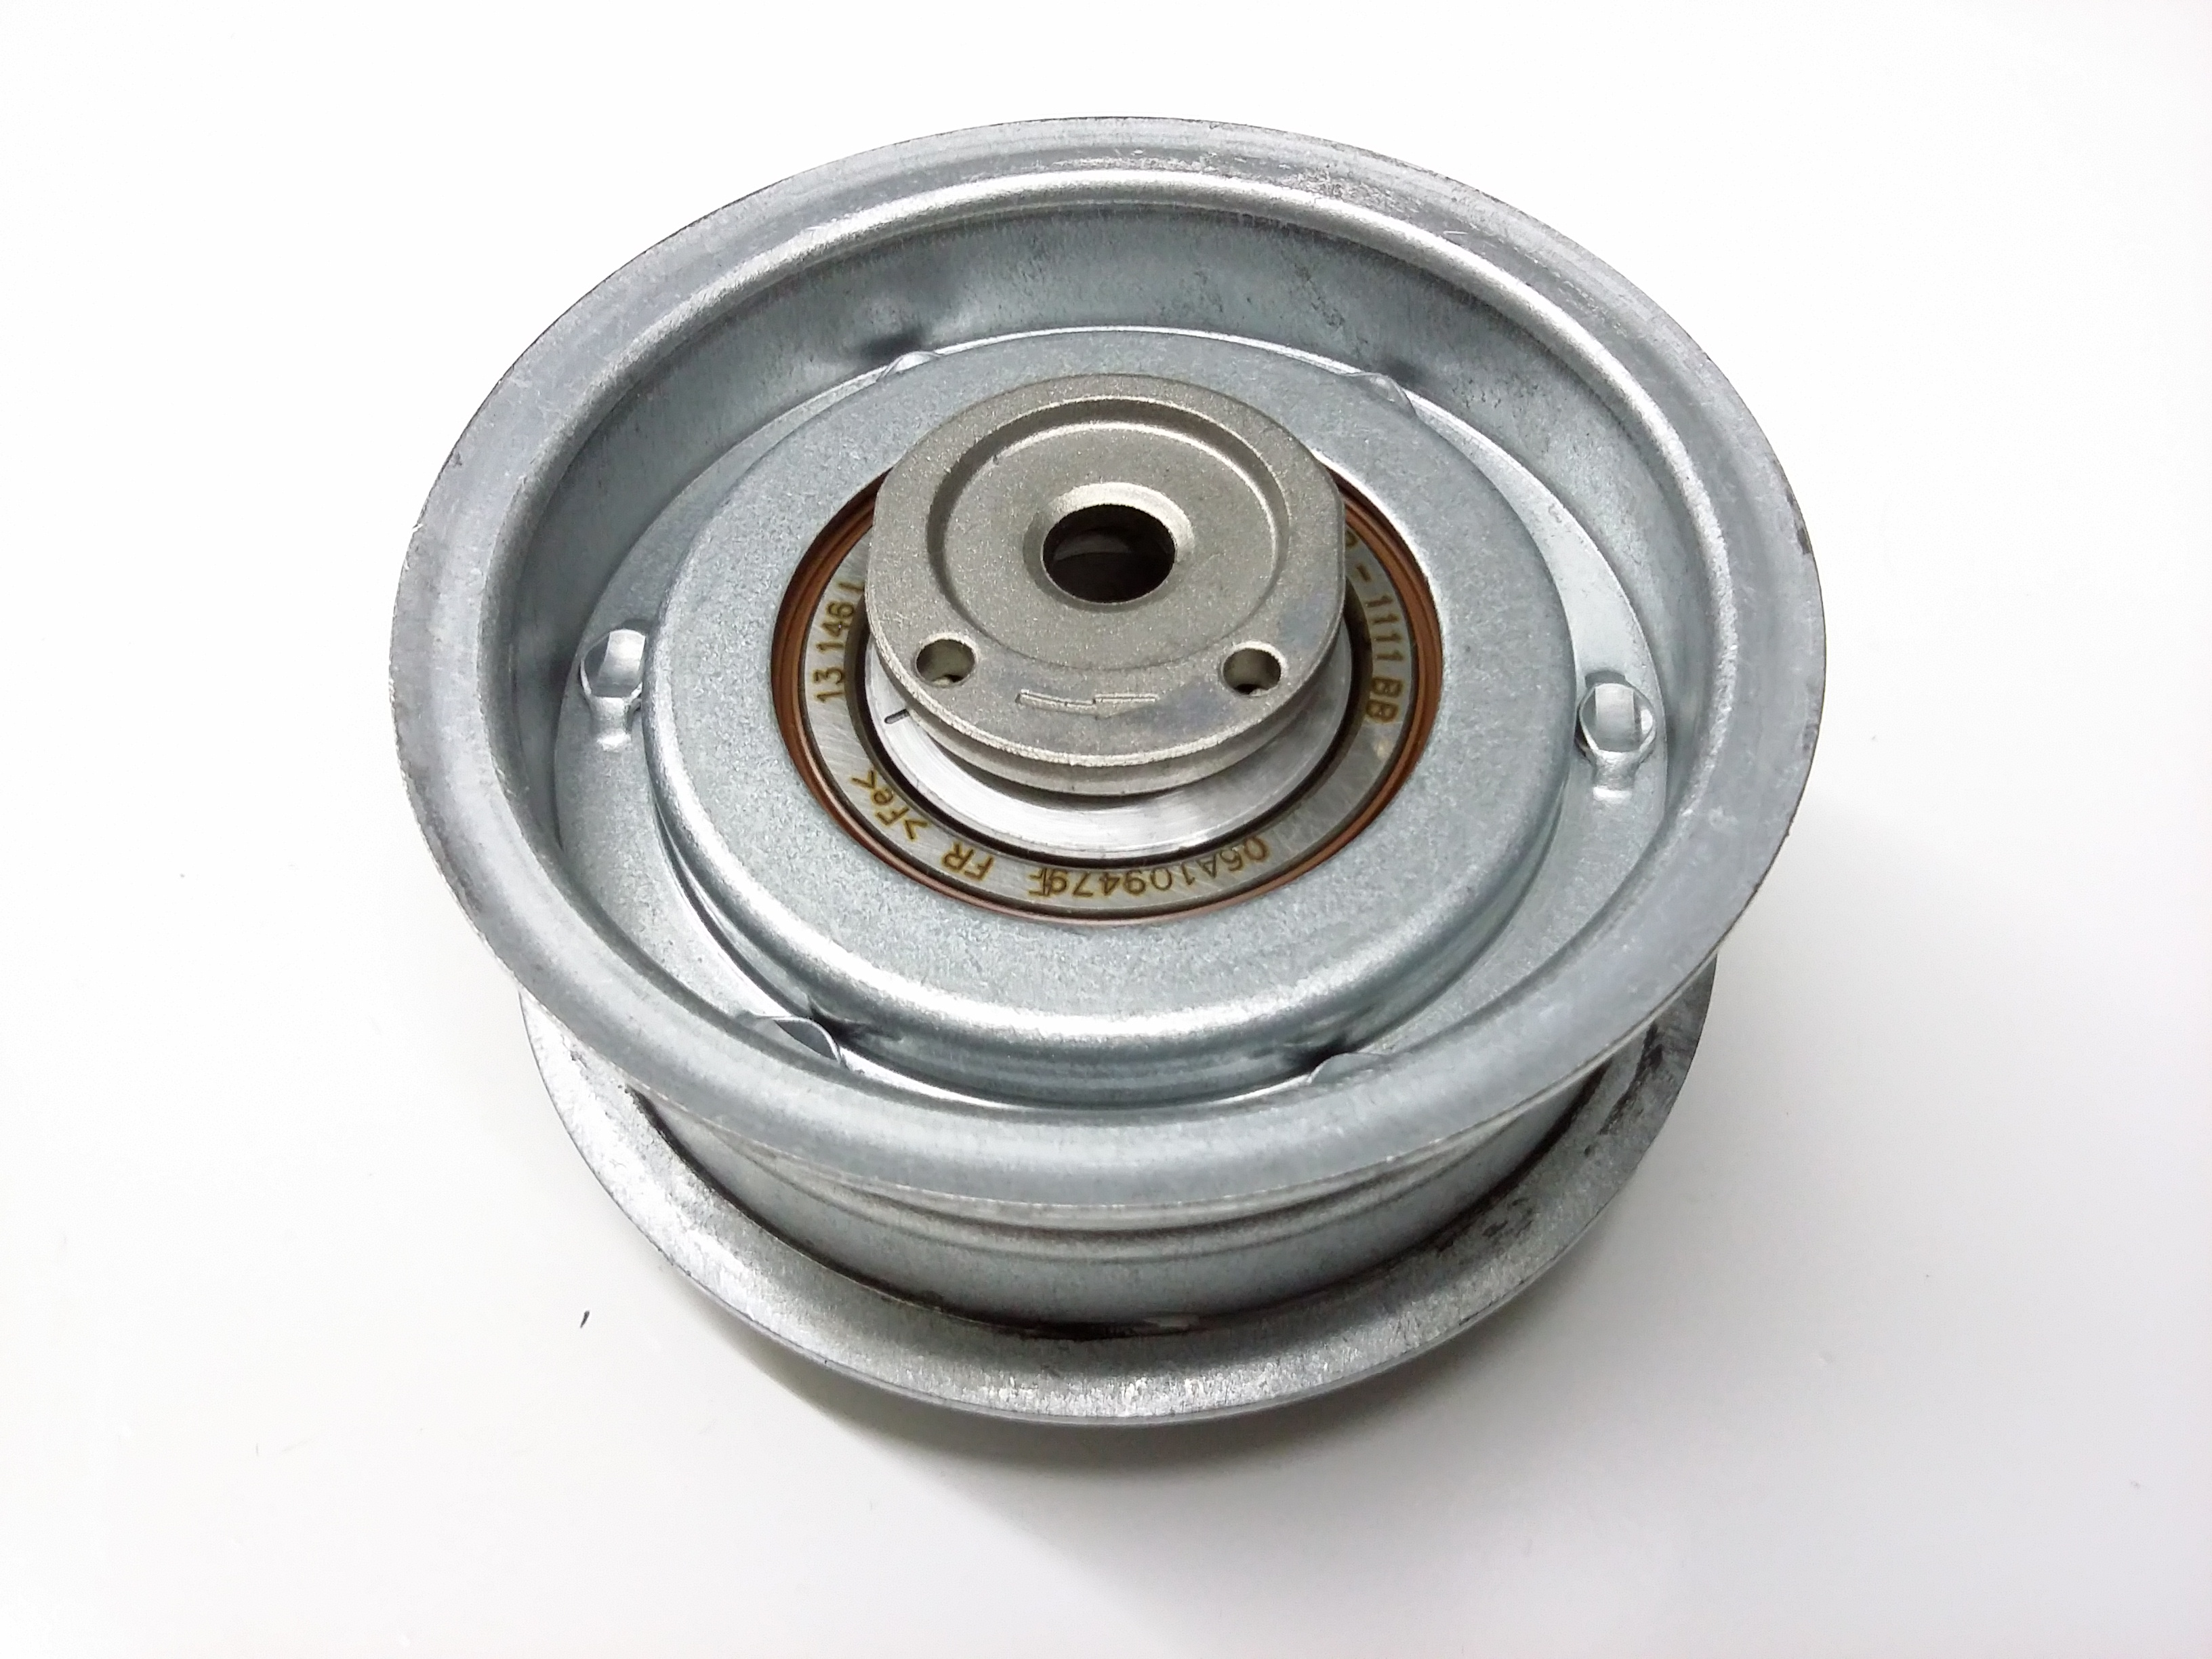 Pulley Tensioner Bar : Volkswagen jetta belt tensioner engine timing